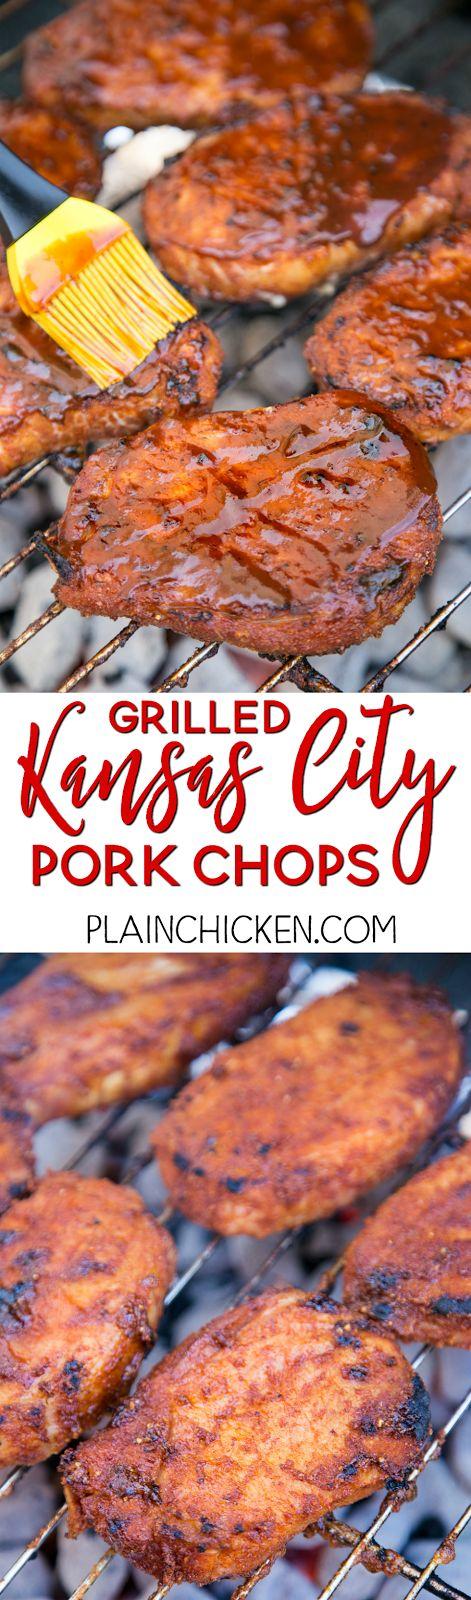 about Pork Chop Marinade on Pinterest | Pork marinade, Easy pork chop ...